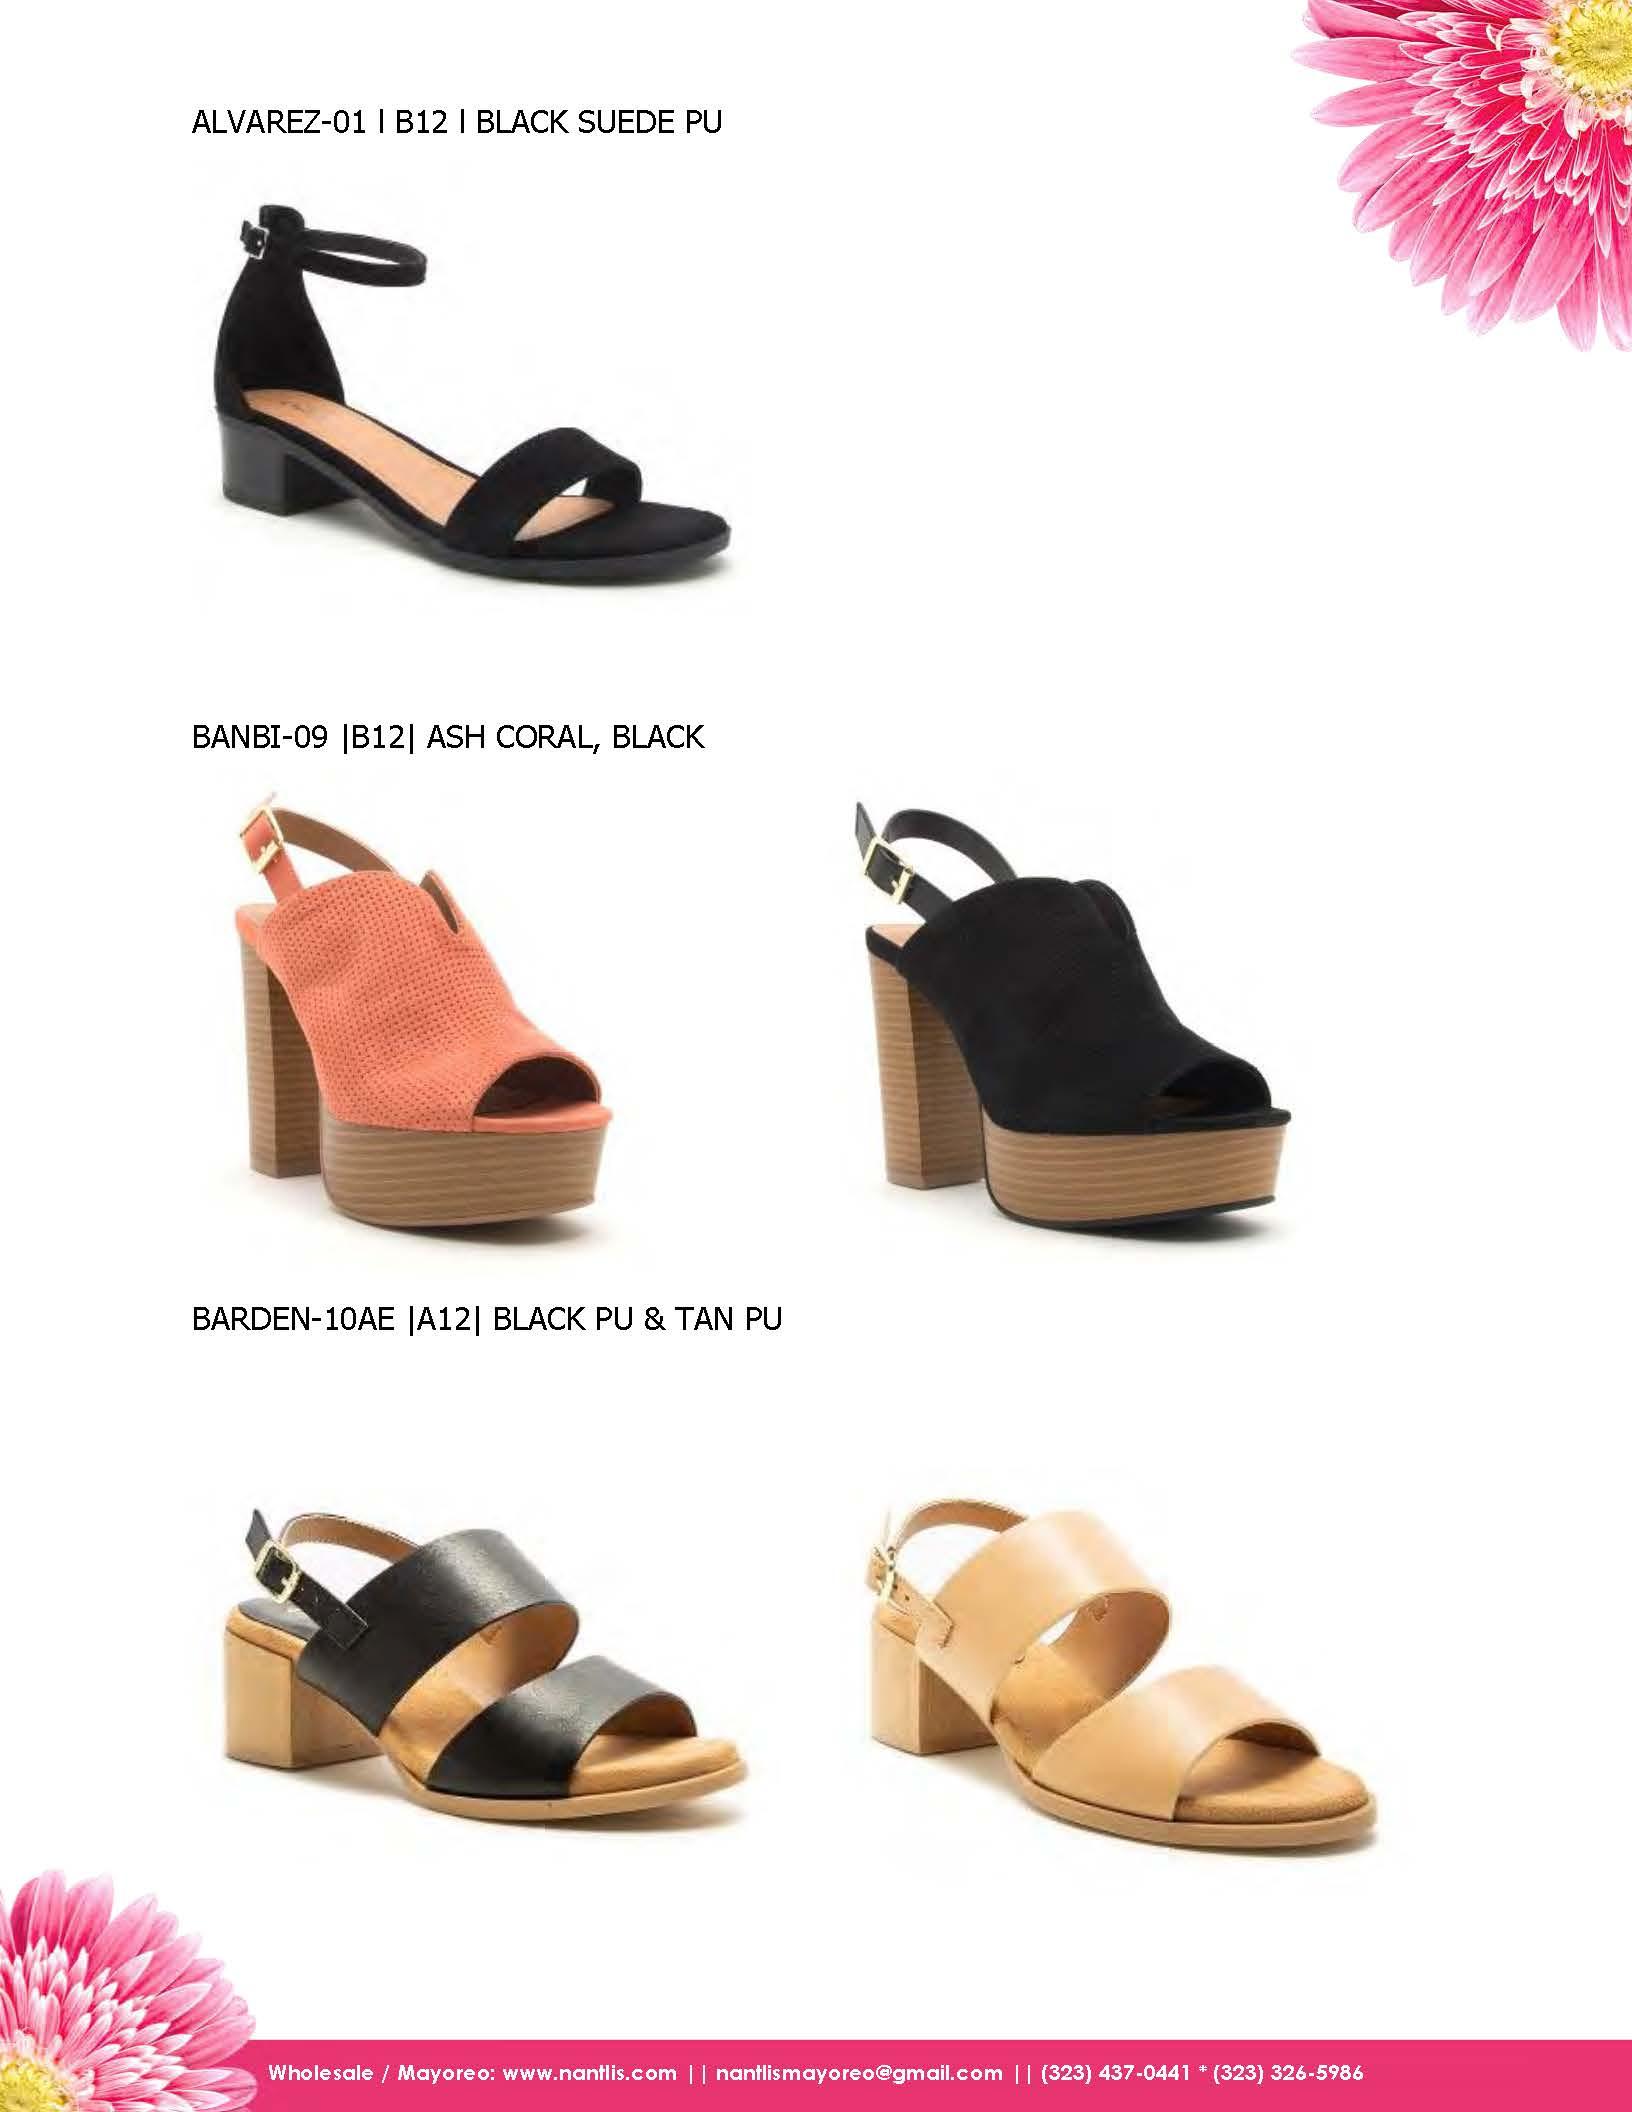 Nantlis Vol QU43 Zapatos para mujer mayoreo Wholesale shoes for women_Page_02